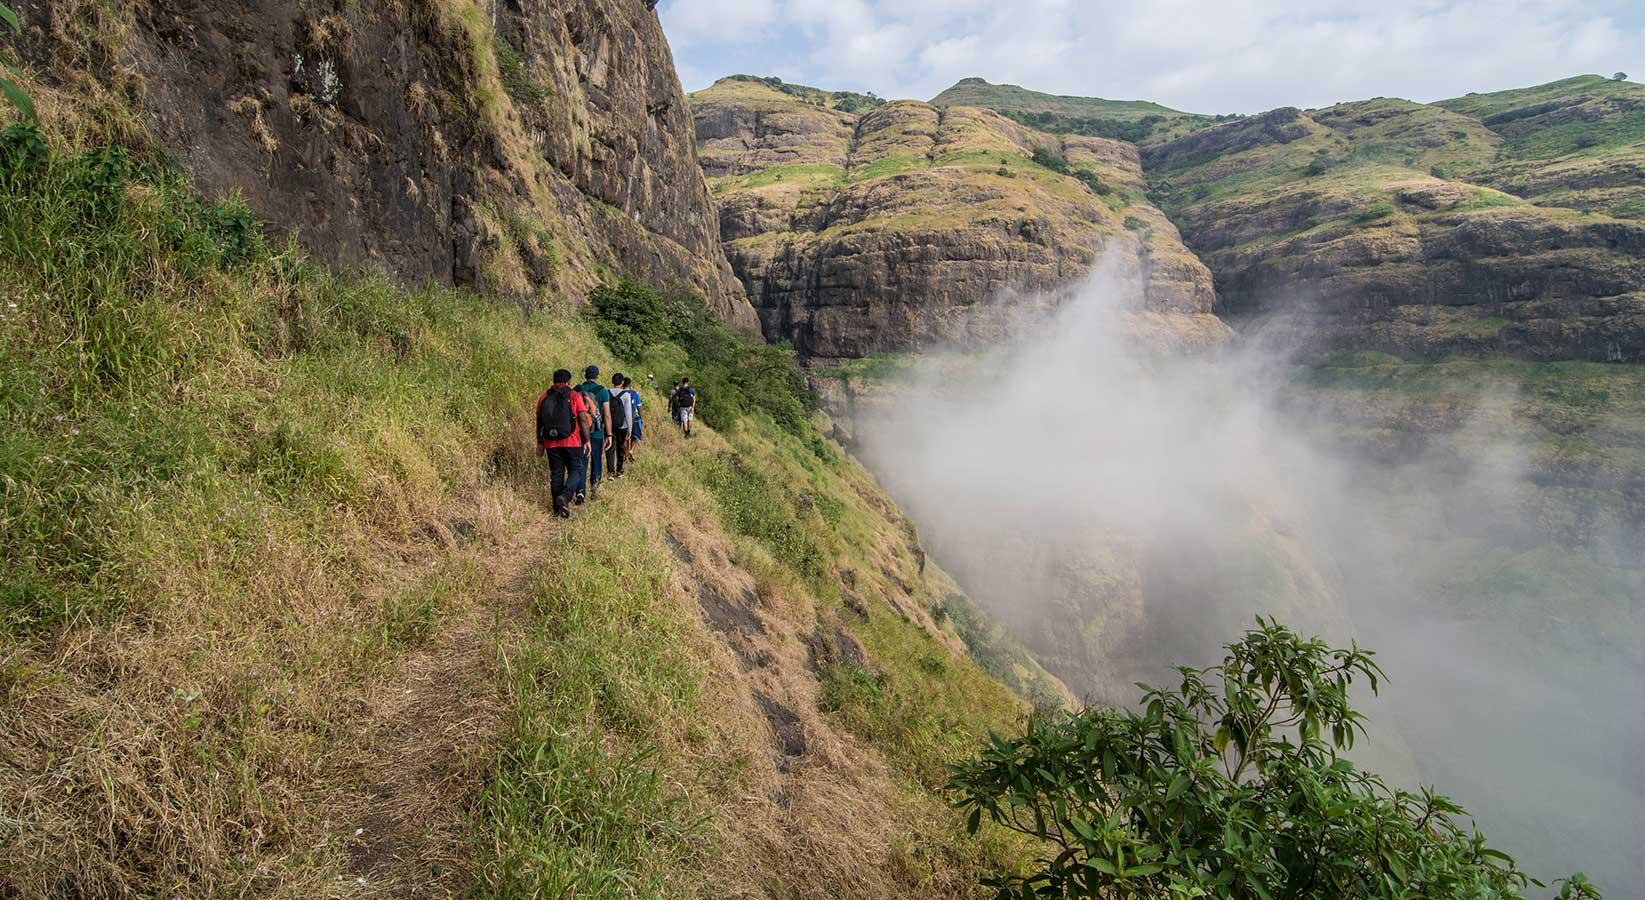 Kalsubai Is An Easy Trek Up Maharashtra's Tallest Peak